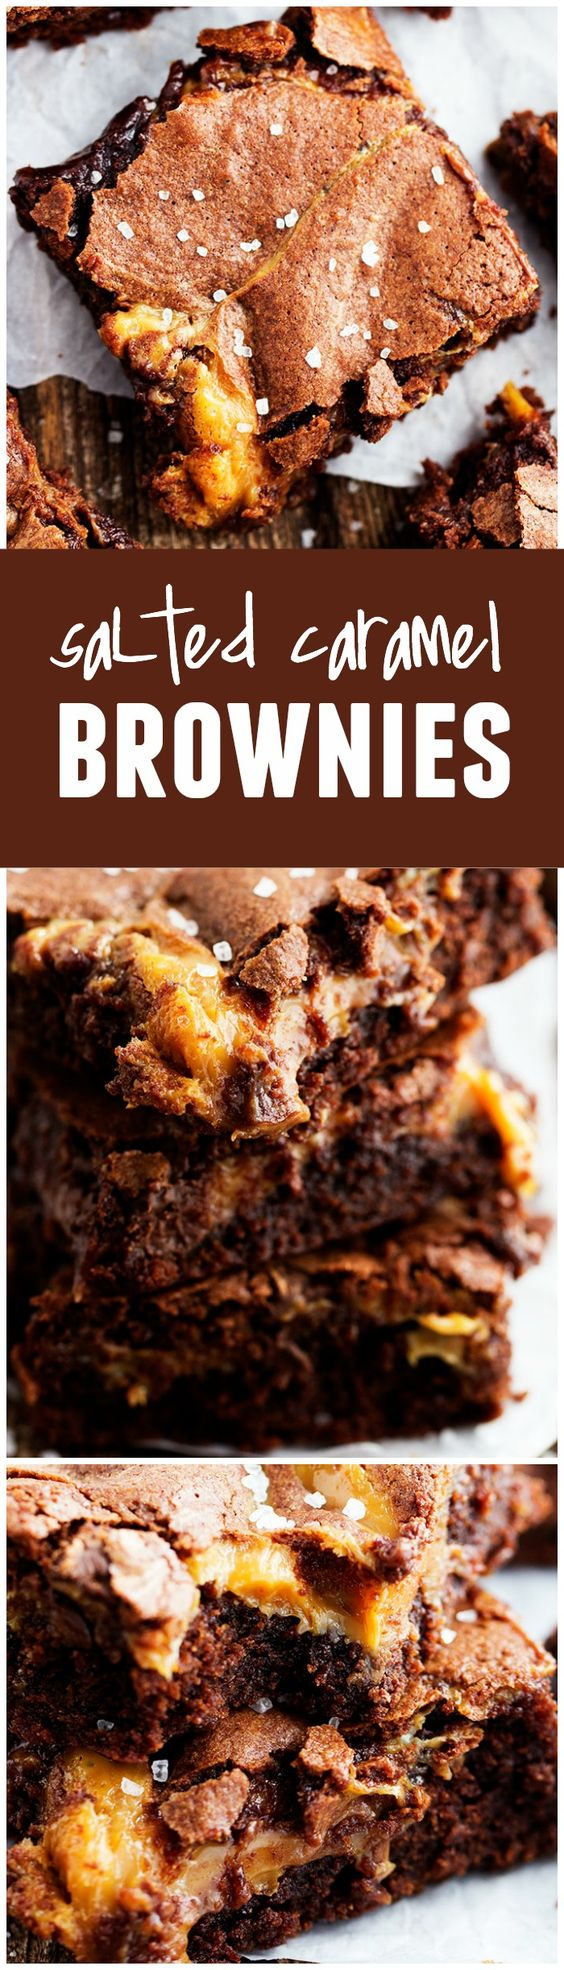 Salted caramel brownies, Caramel brownies and Salted caramels on ...